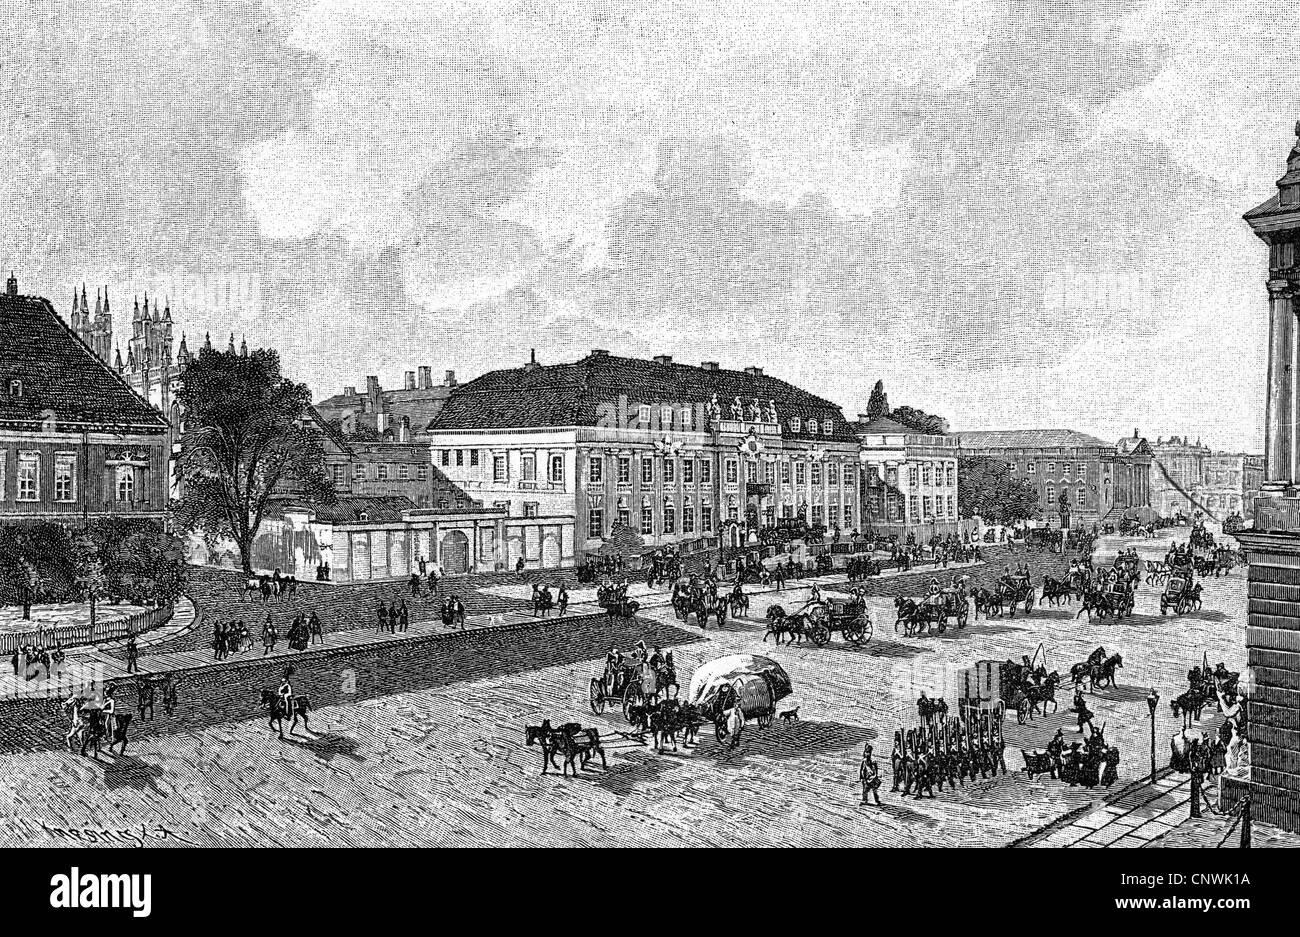 geography / travel, Germany, Berlin, royal palace (emperor palace), Zeughausplatz (armoury square), circa 1830, - Stock Image